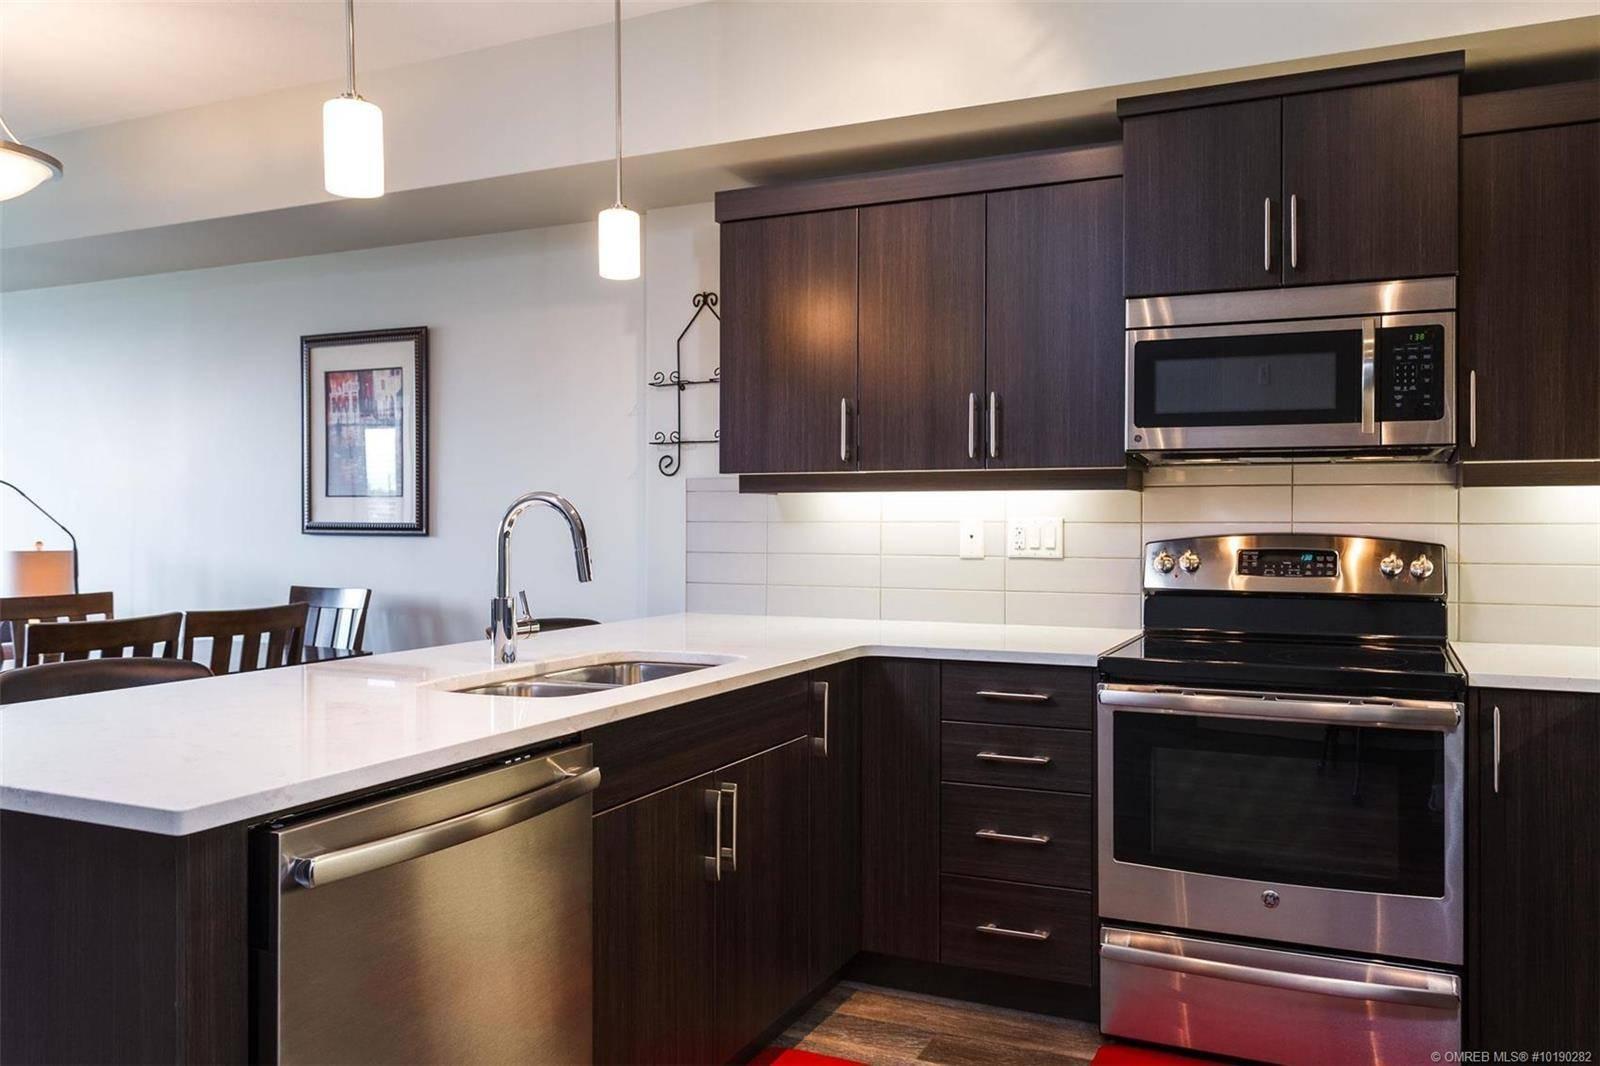 Condo for sale at 3731 Casorso Rd Unit 207 Kelowna British Columbia - MLS: 10190282